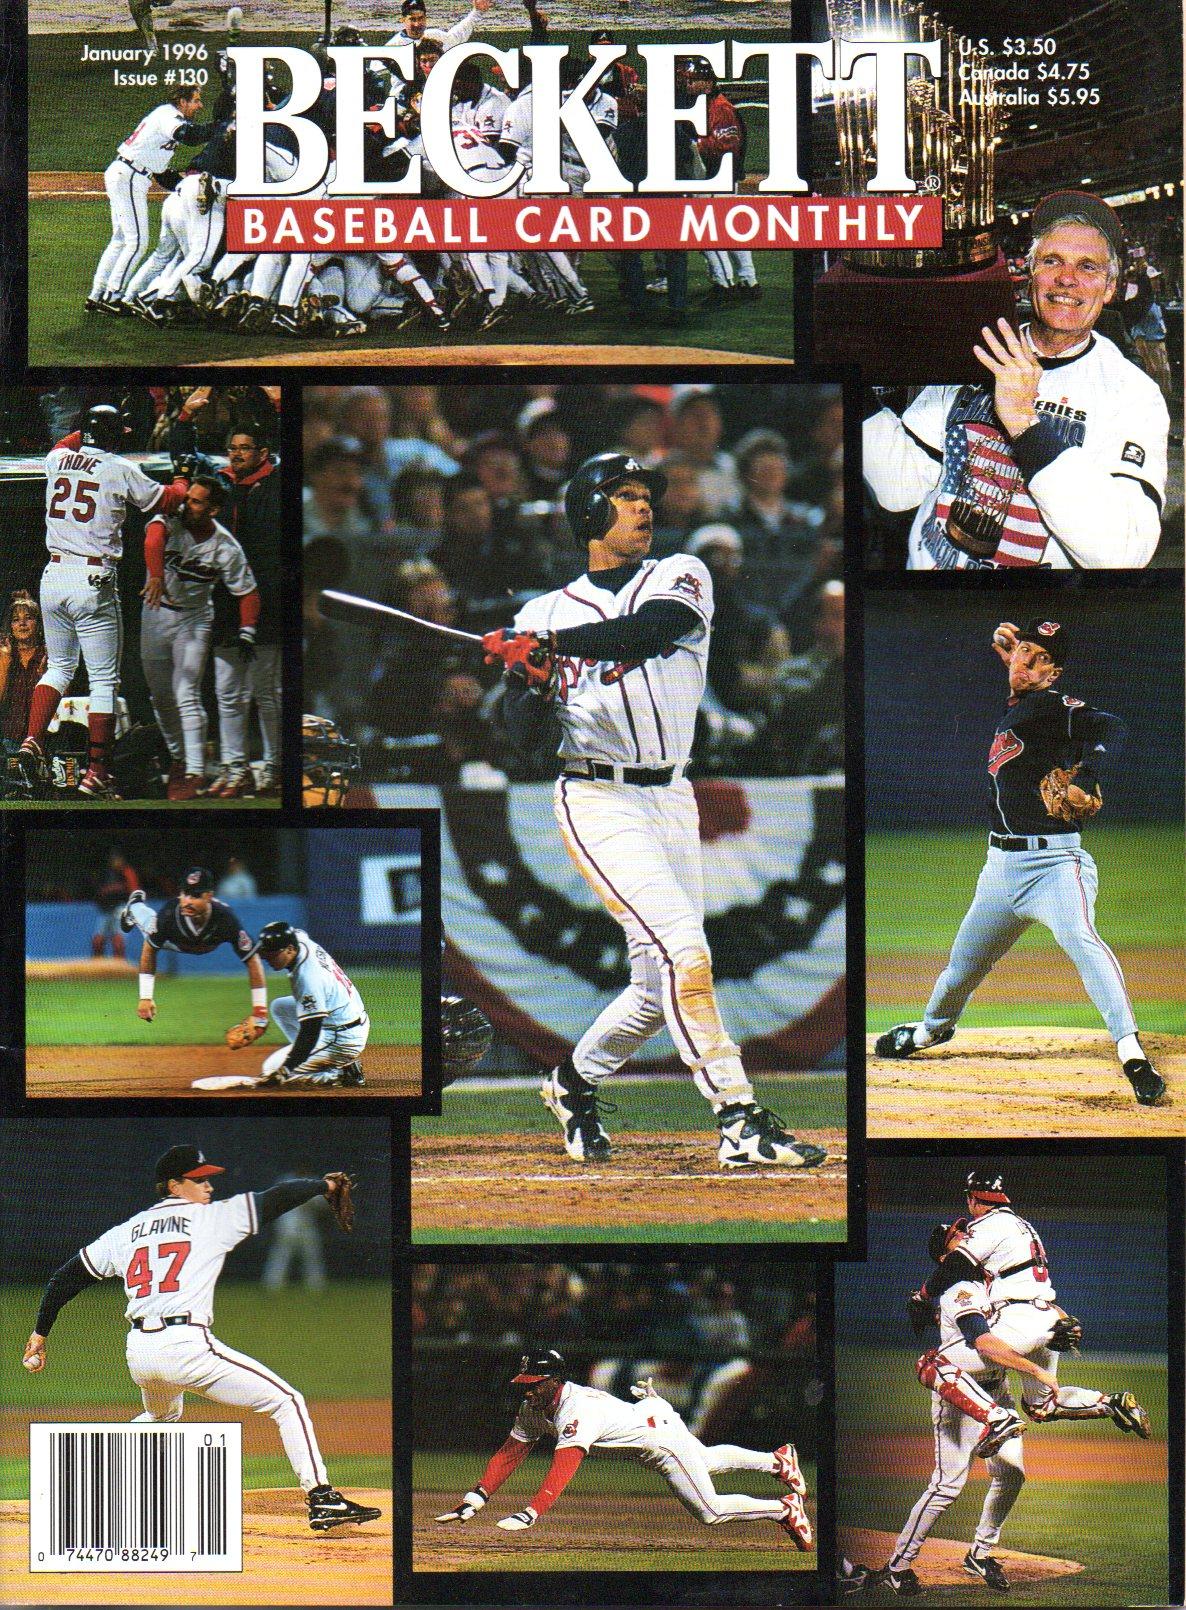 1970s To 2000s Baseball Books Tuff Stuff Price Guids For Sale